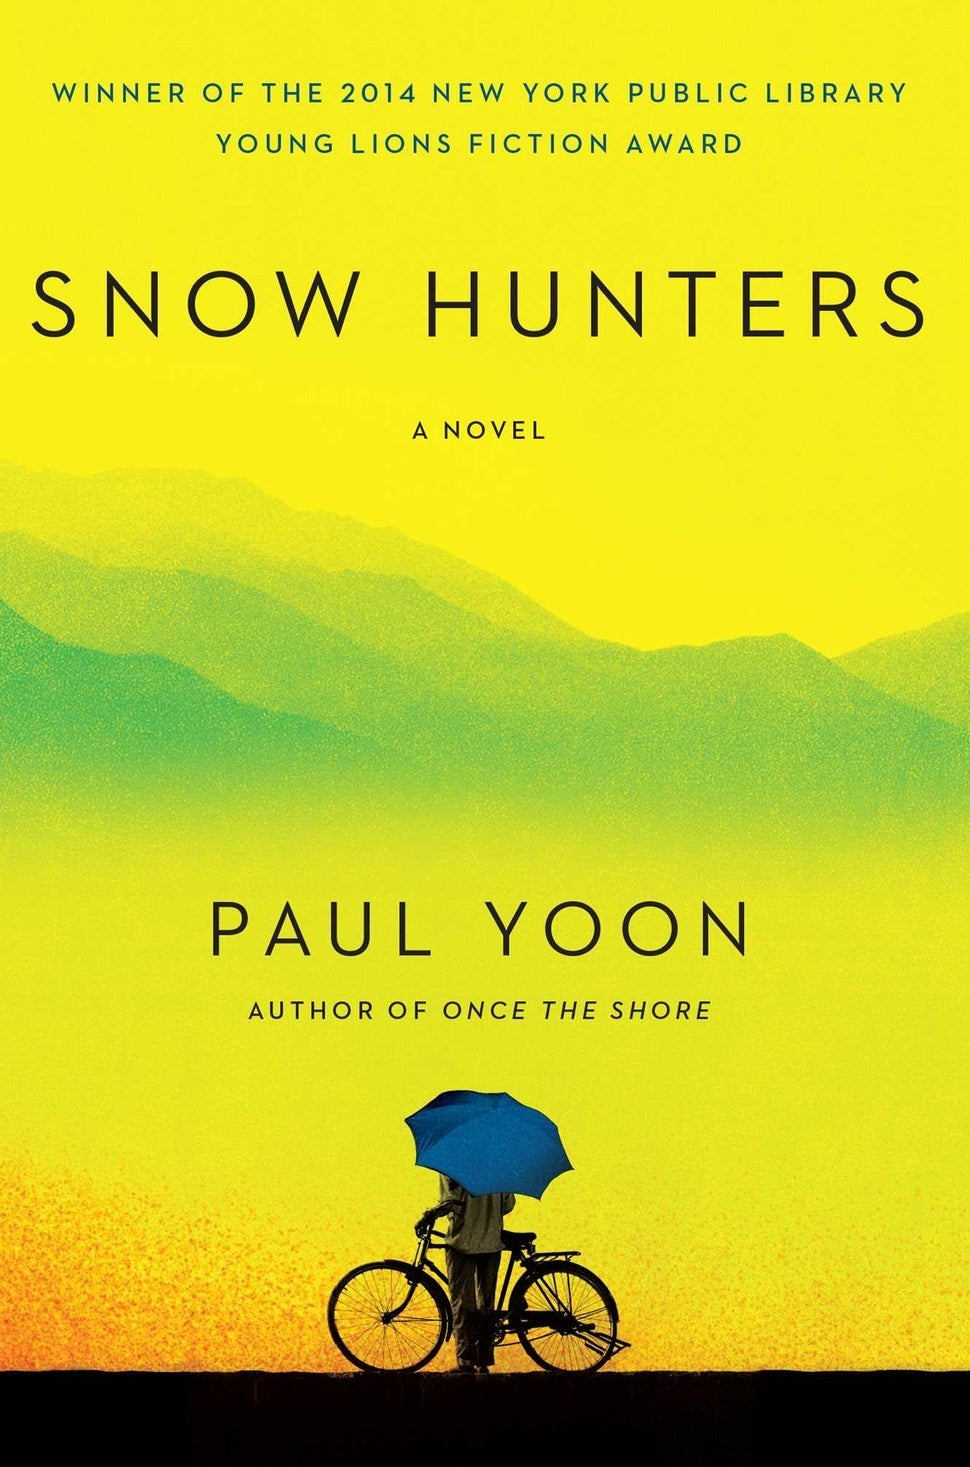 Snow Hunters by Paul Yoon